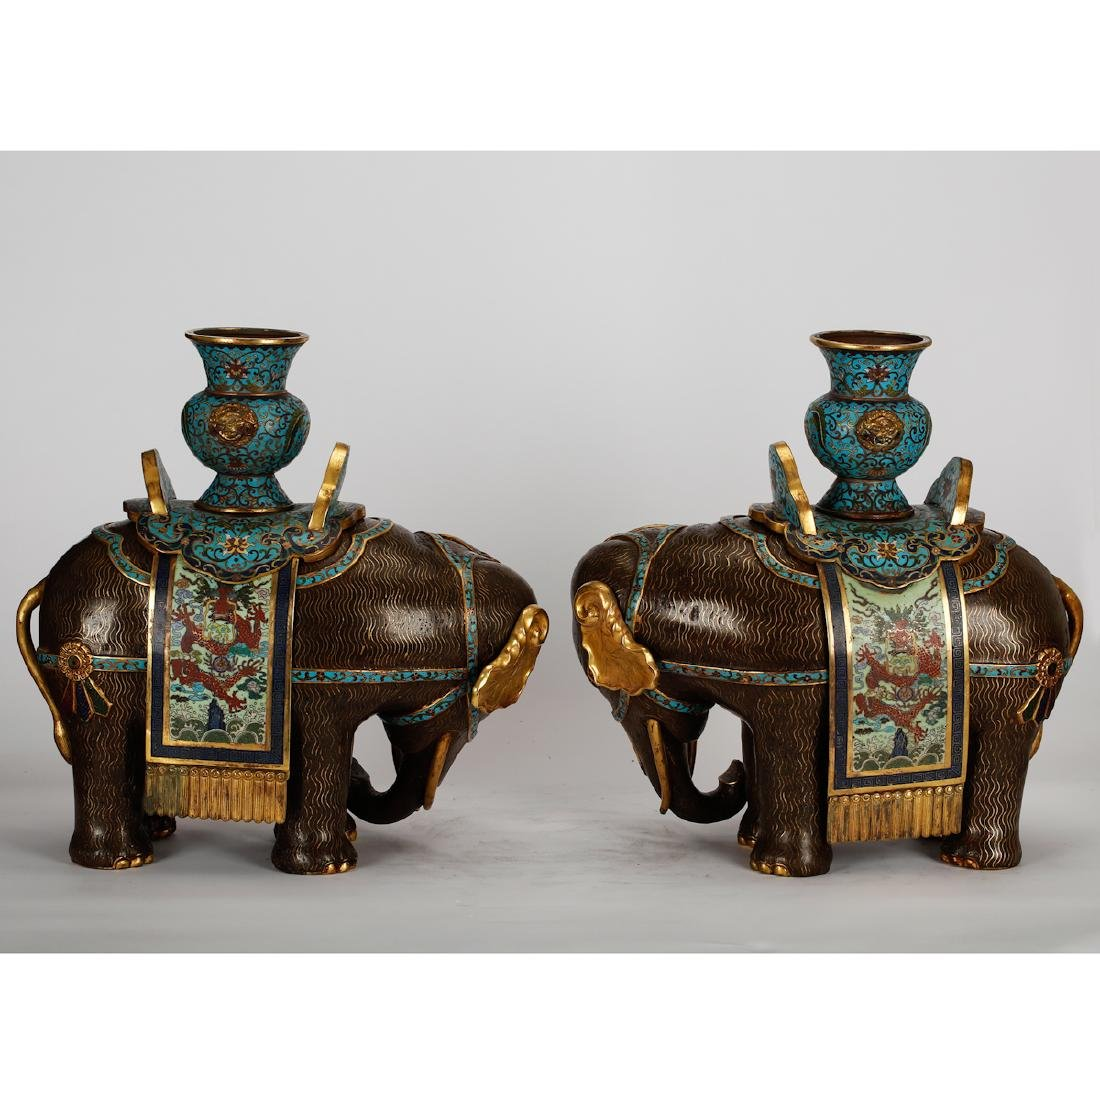 CHINESE CLOISONNE ELEPHANTS, PAIR - 2